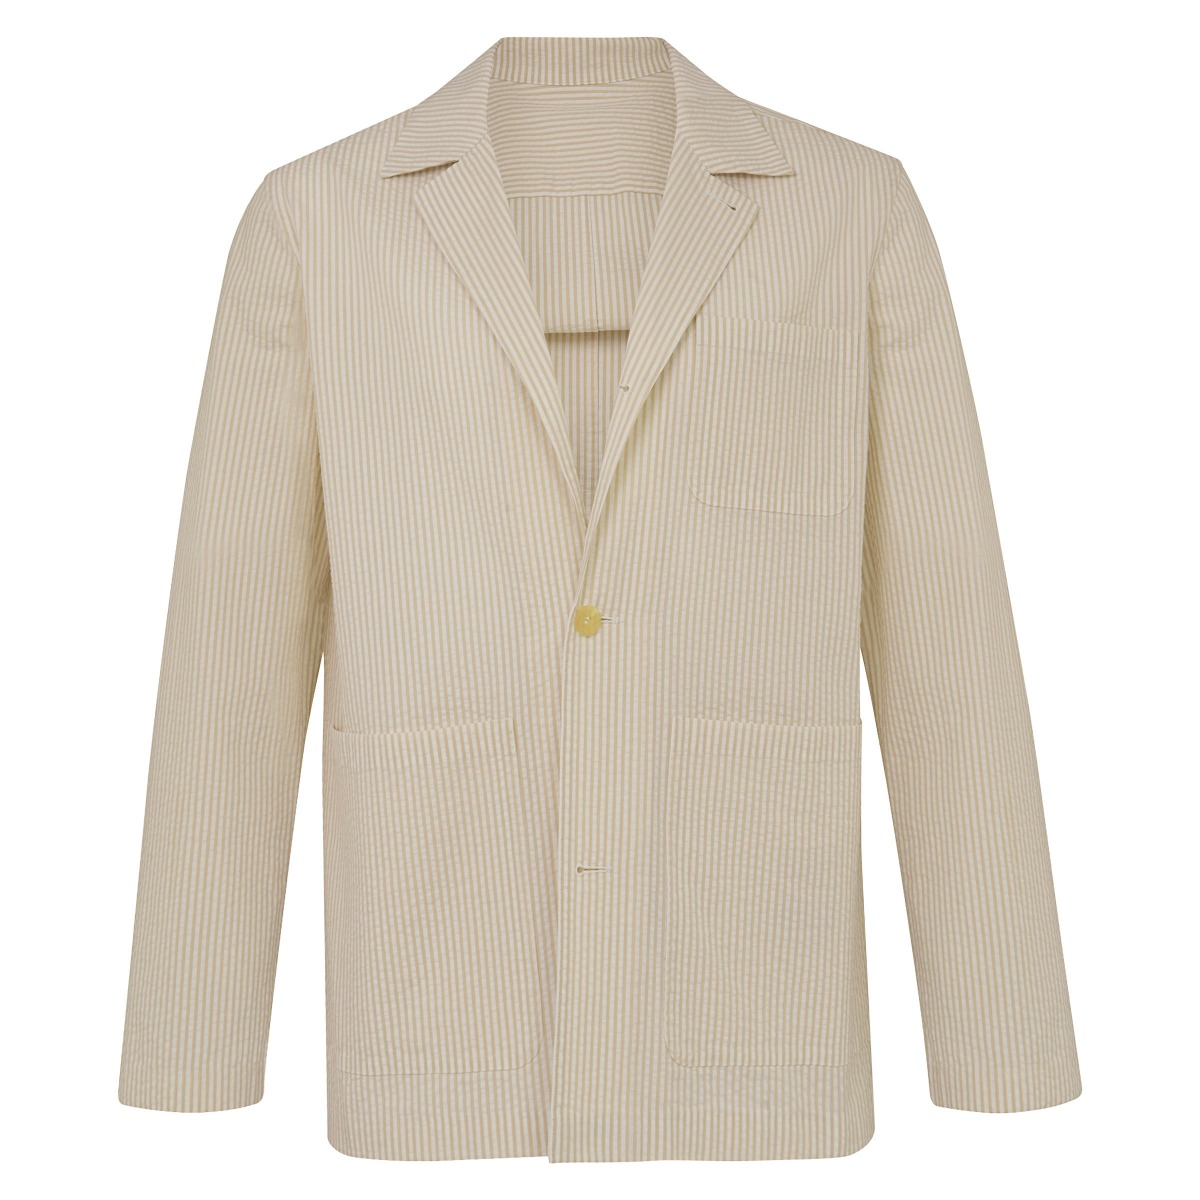 White & Tan Cotton Seersucker Lazyman Jacket